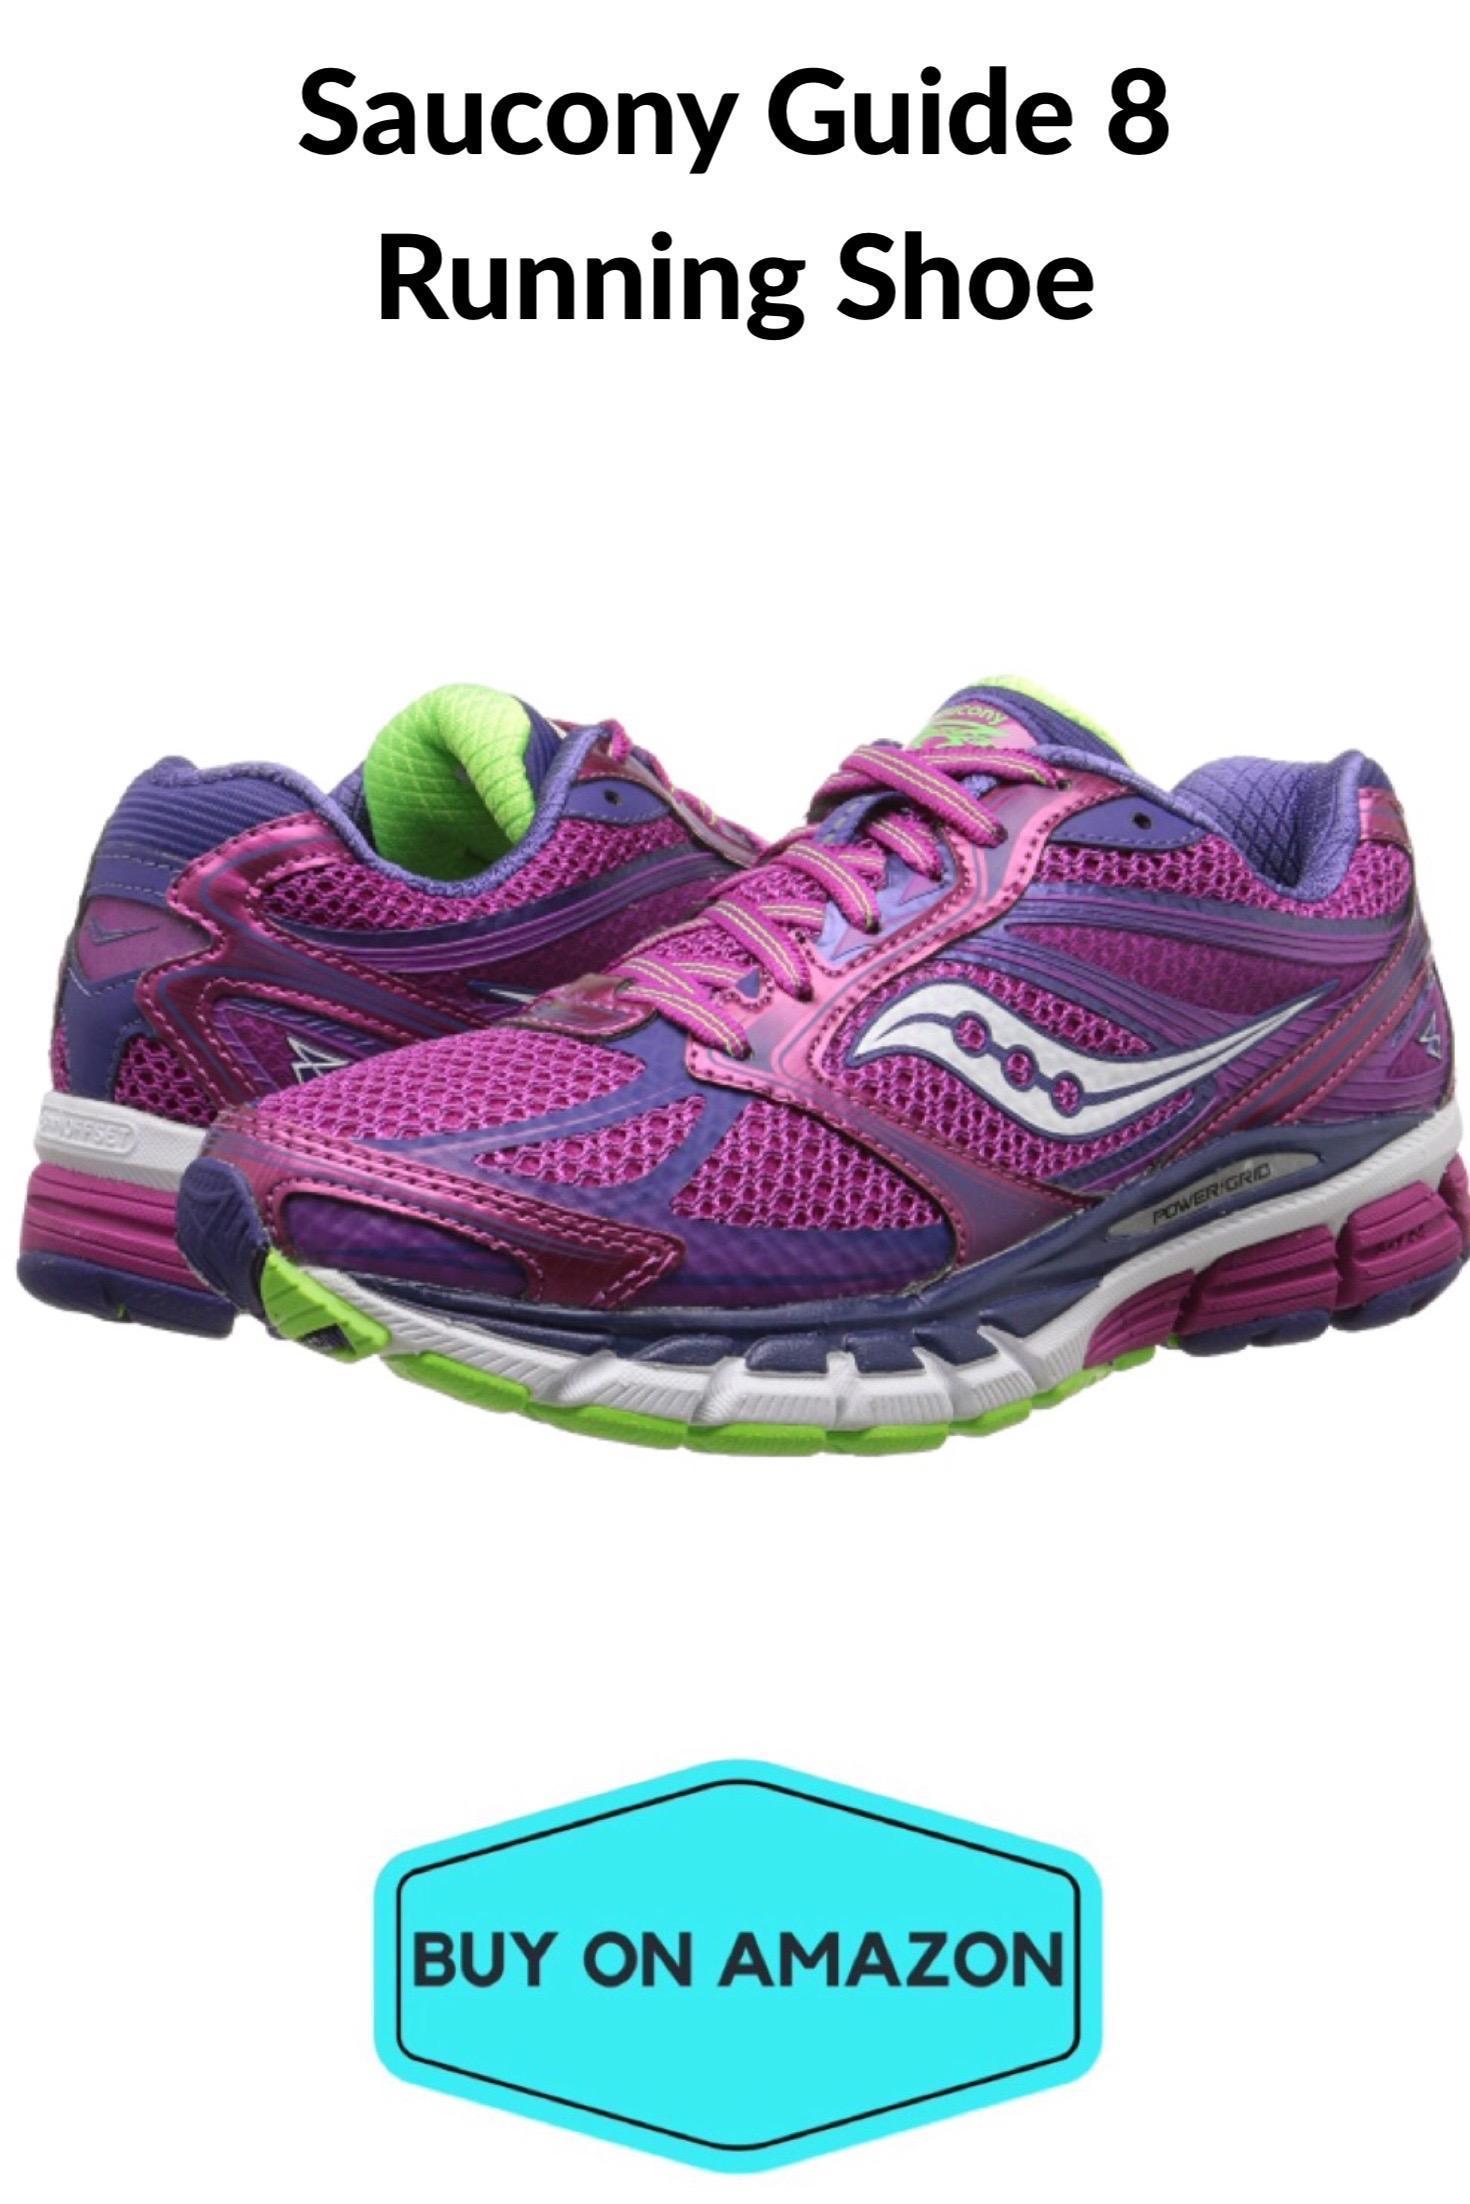 Saucony Guide 8 Women's Running Shoe